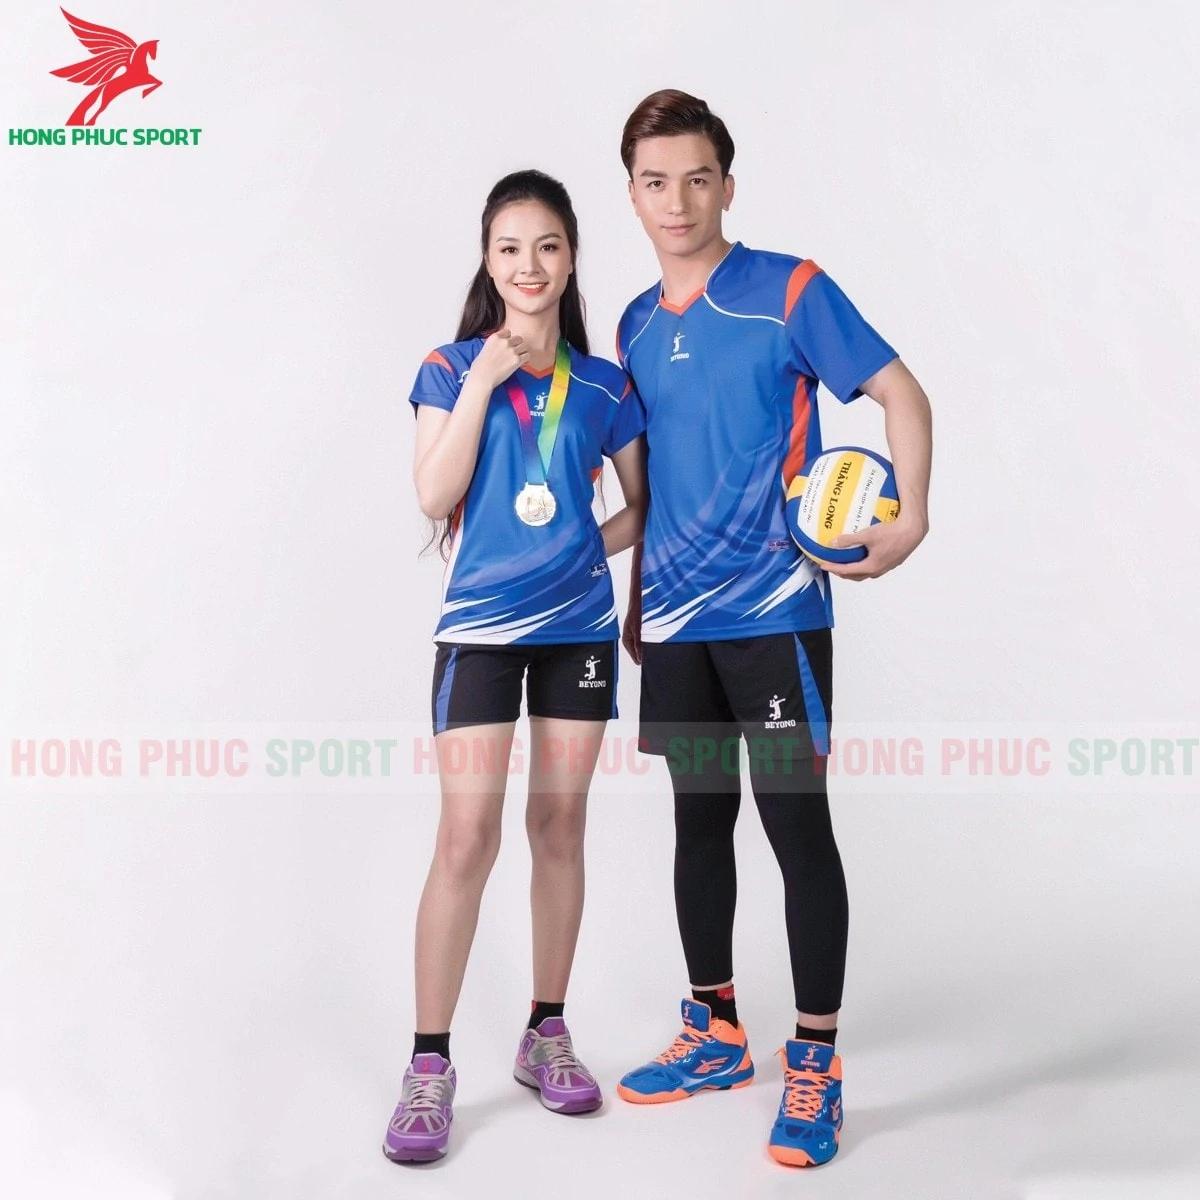 https://cdn.hongphucsport.com/unsafe/s4.shopbay.vn/files/285/ao-bong-chuyen-beyono-2020-striving-be-nippy-xanh-5f745ce0a9325.png